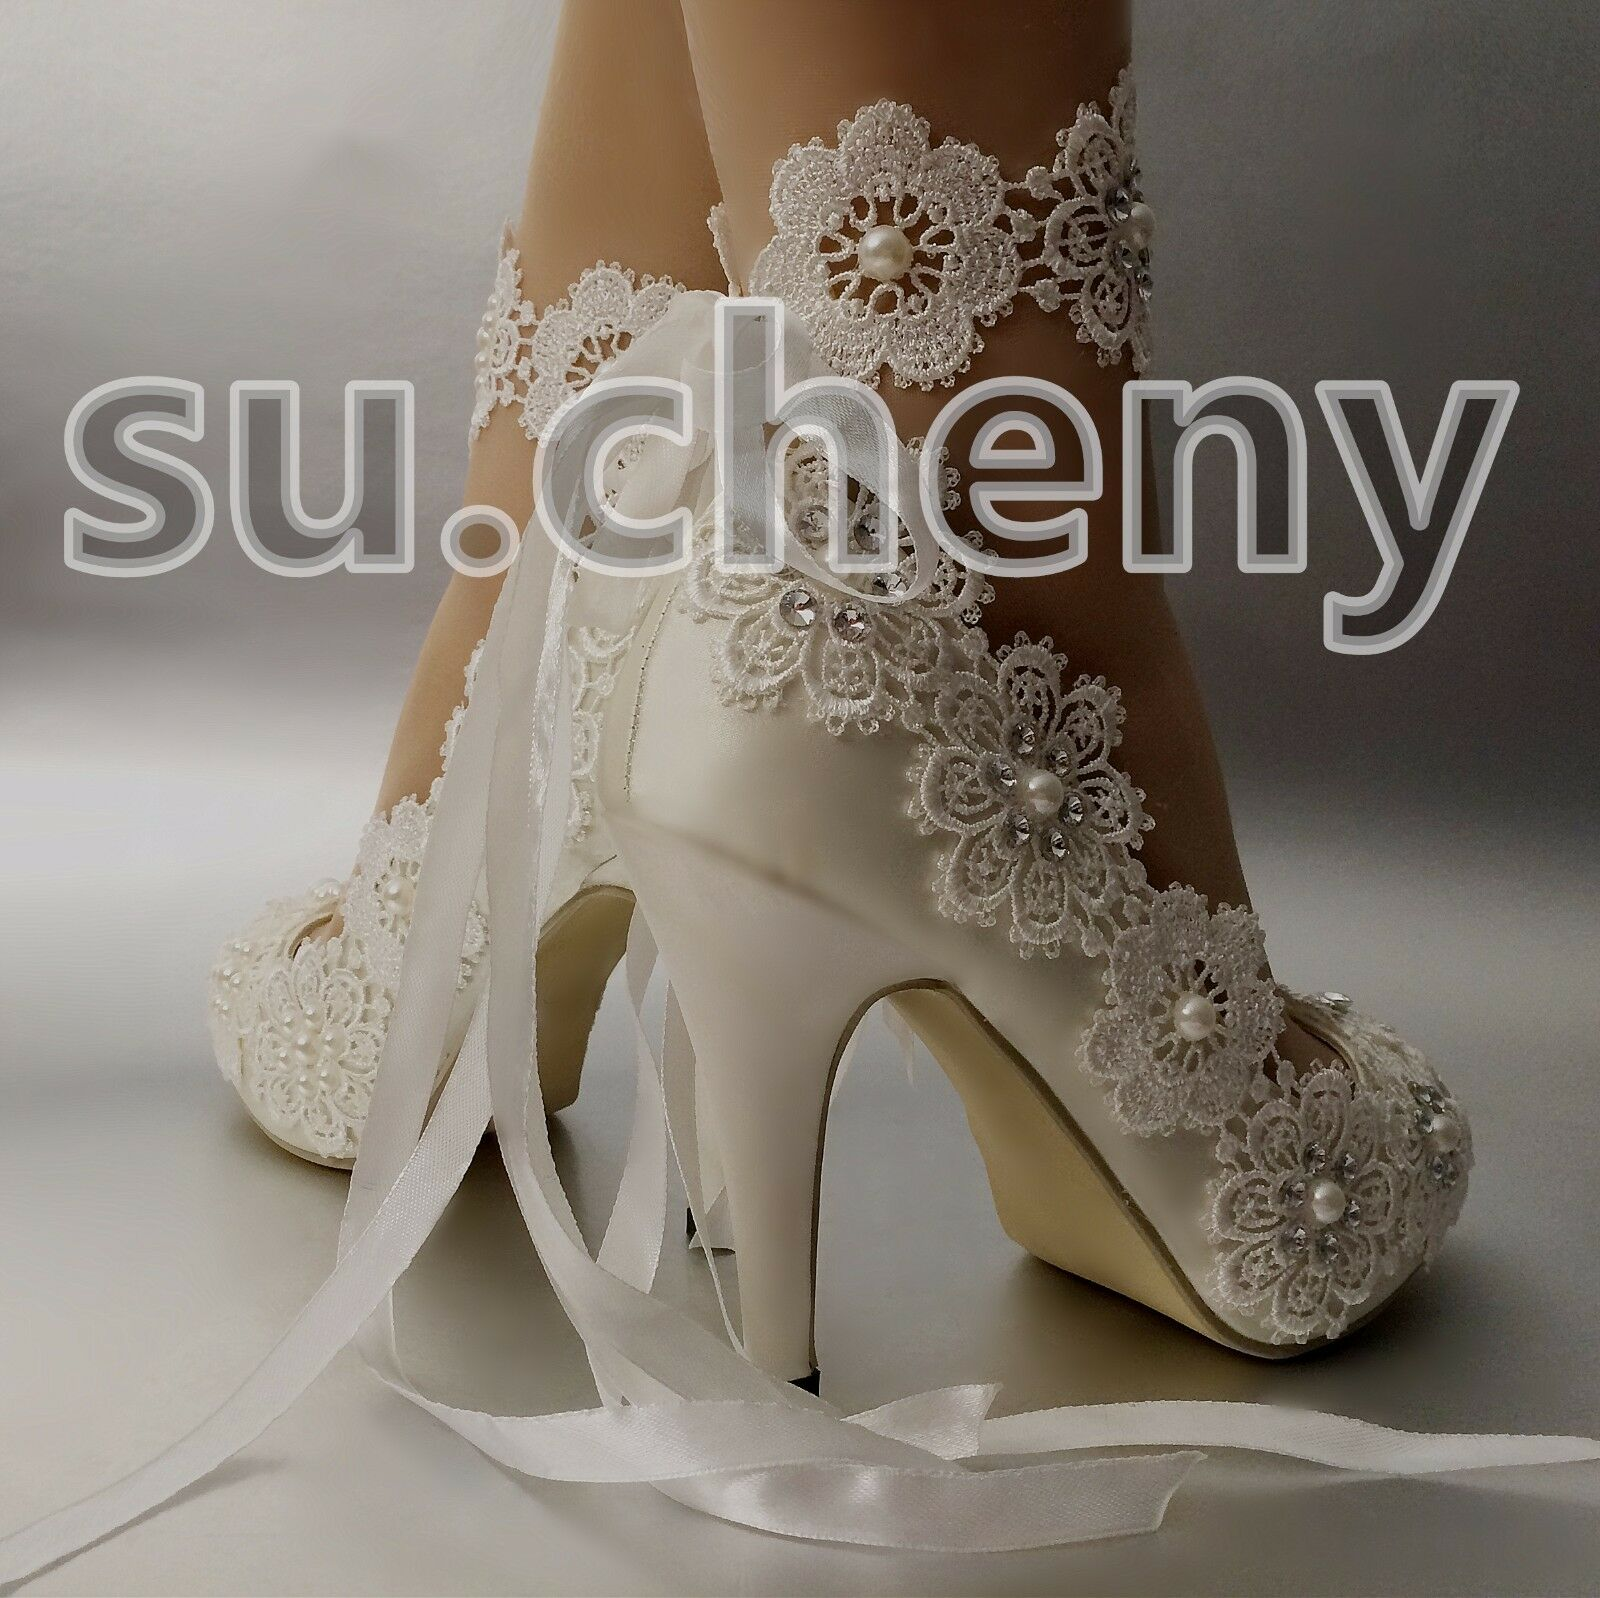 "a5a22d546aa Обувь для свадьбы su.cheny 3""4""Snowflake satin white ivory lace open toe heel  Wedding Bridal shoes - 162458388393 - купить на eBay.com (США) с доставкой  в ..."